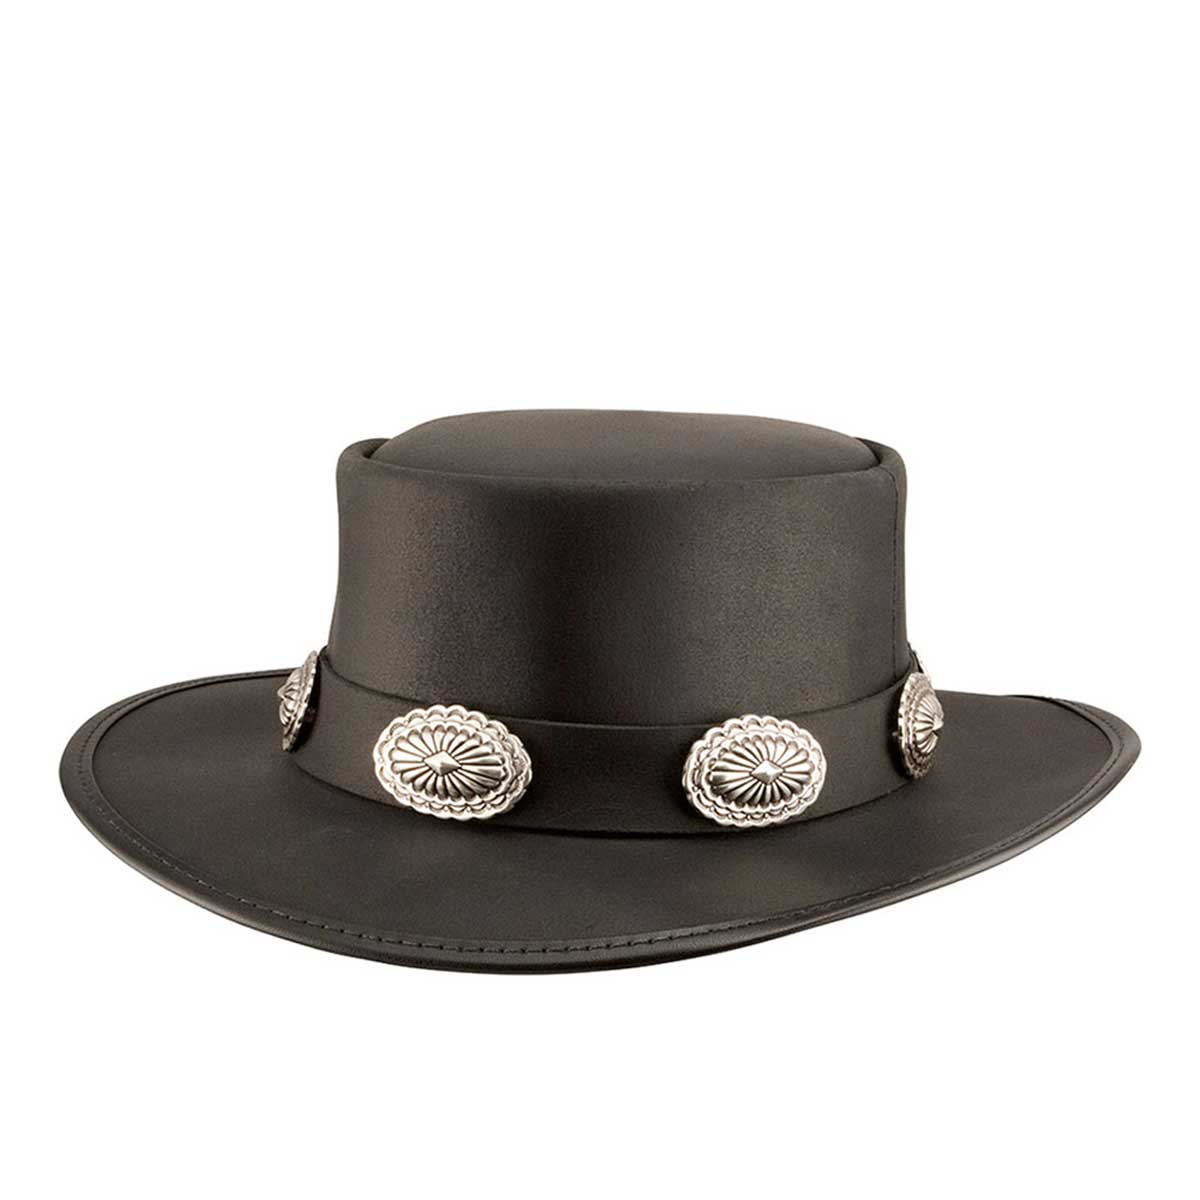 HEAD'N HOME Hats / Silverado Big Concho Band BLACK